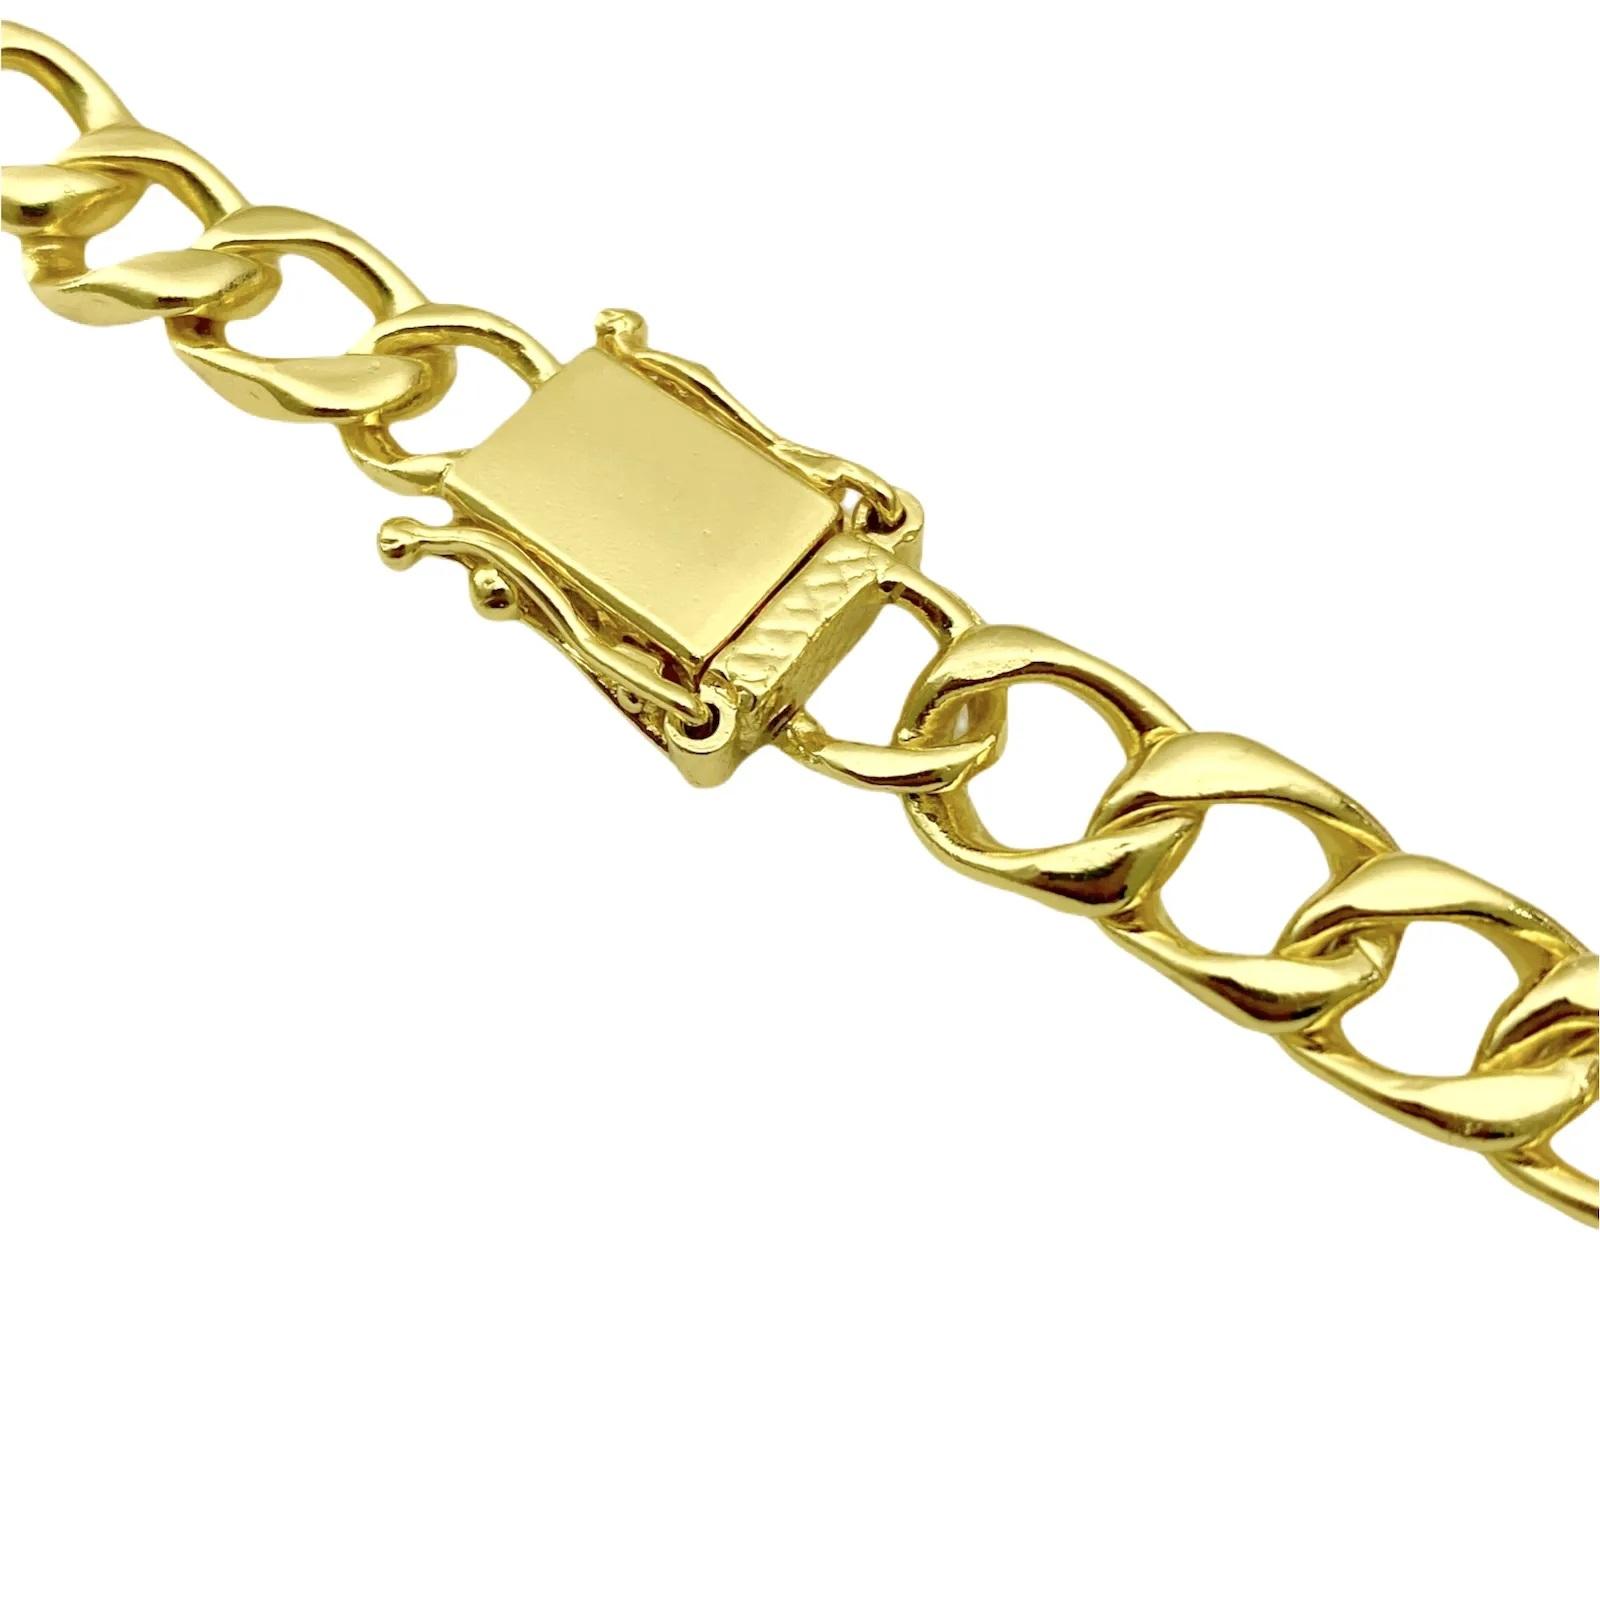 Corrente Grumet 7,5mm 60cm (35g) (Fecho Gaveta Duplo) (Banho Ouro 24k)